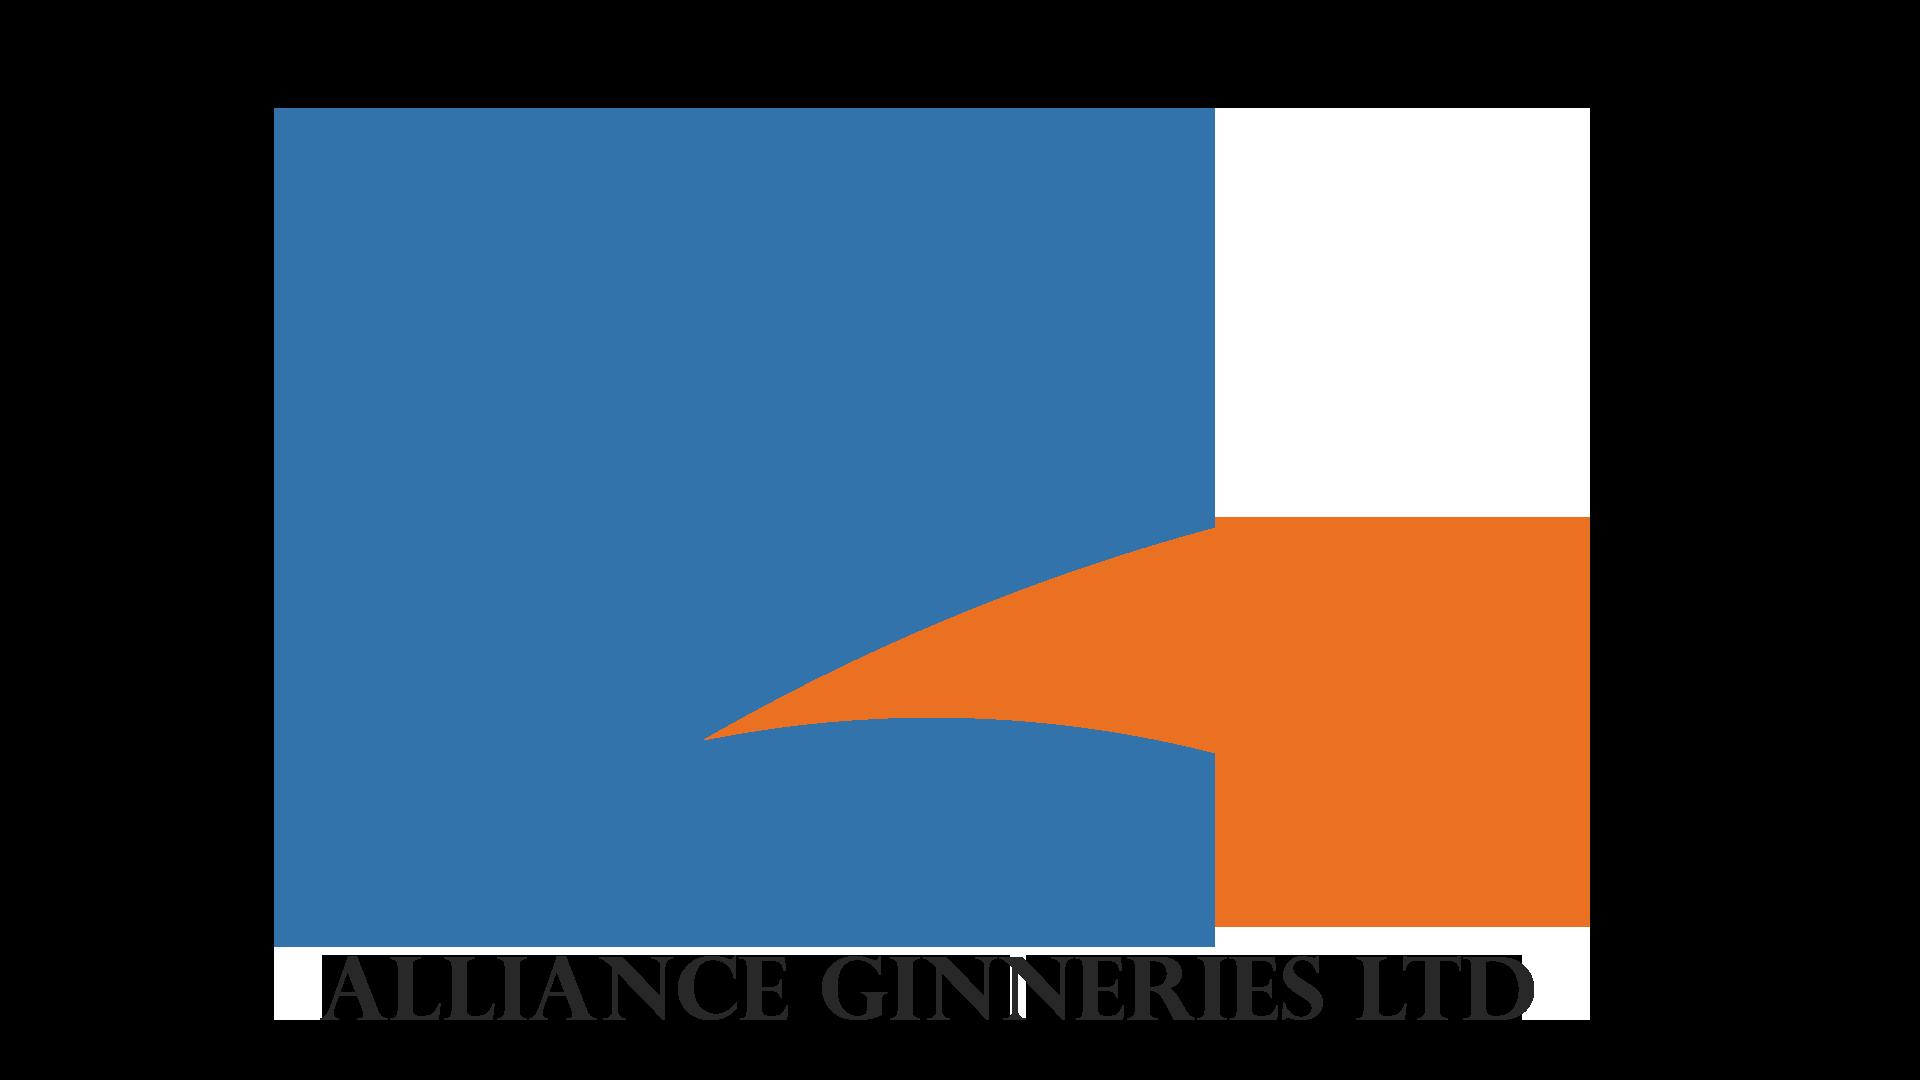 https://cottonmadeinafrica.org/wp-content/uploads/Alliance-Ginneries-LTD-Tanzania.png